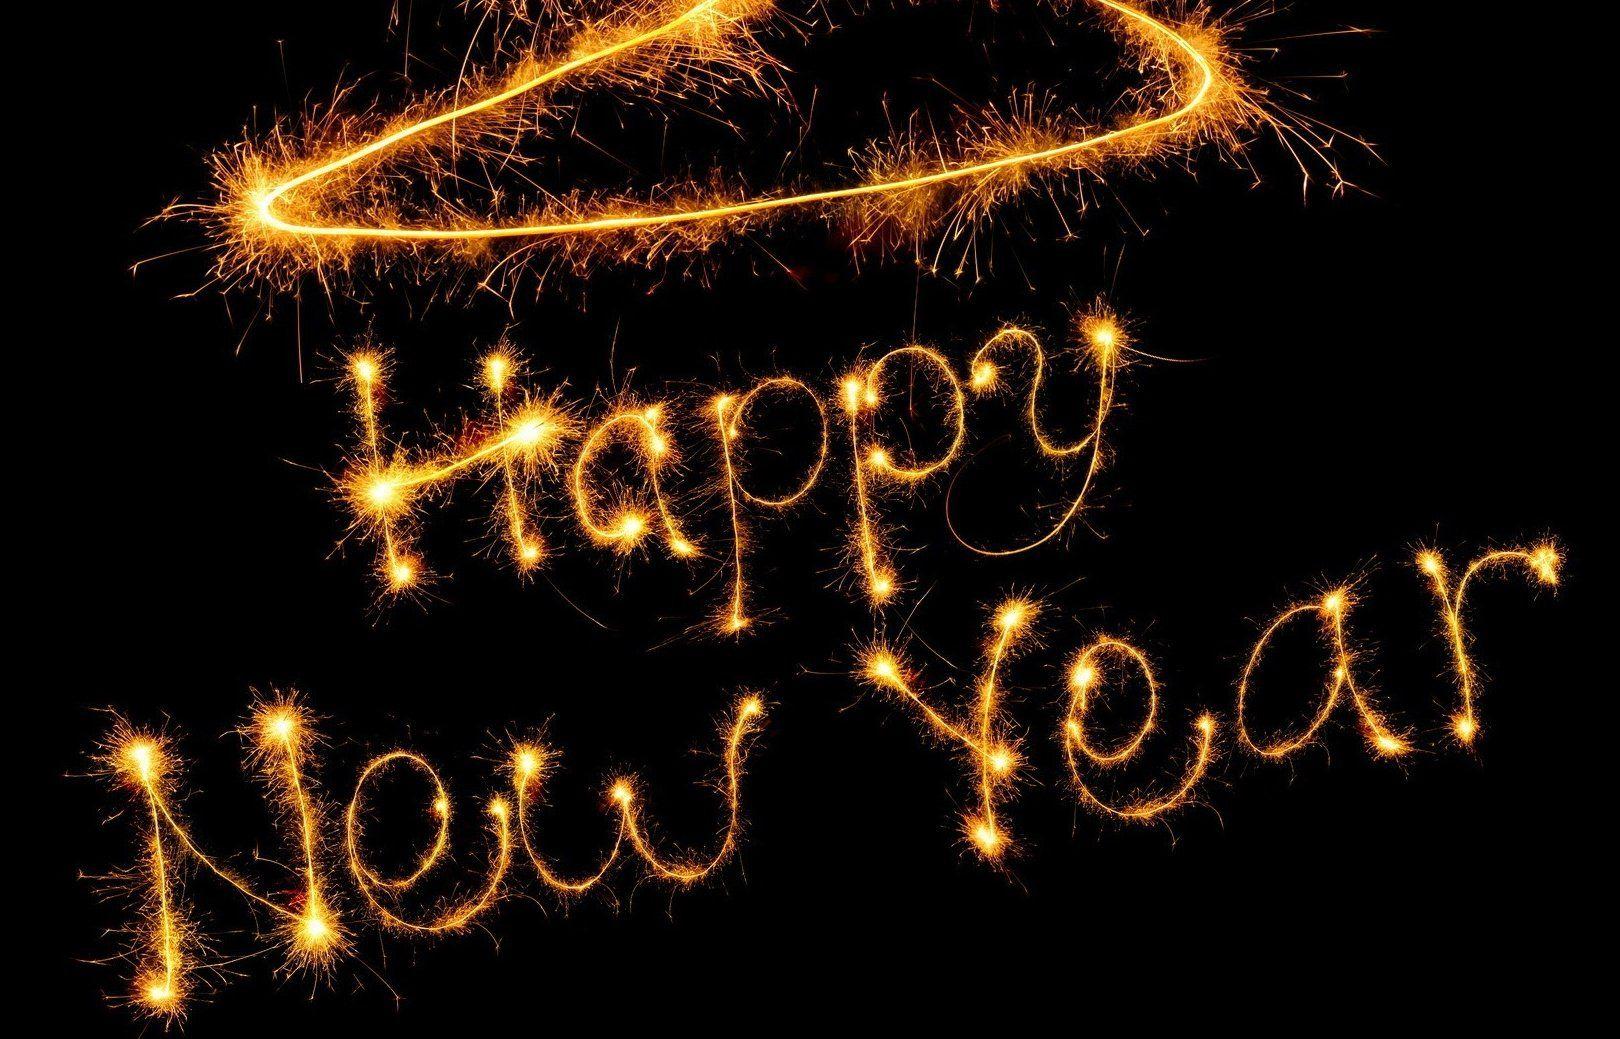 Tarjetas-Feliz-Ano-Nuevo-2015-03   FELIZ AÑO NUEVO!   Pinterest